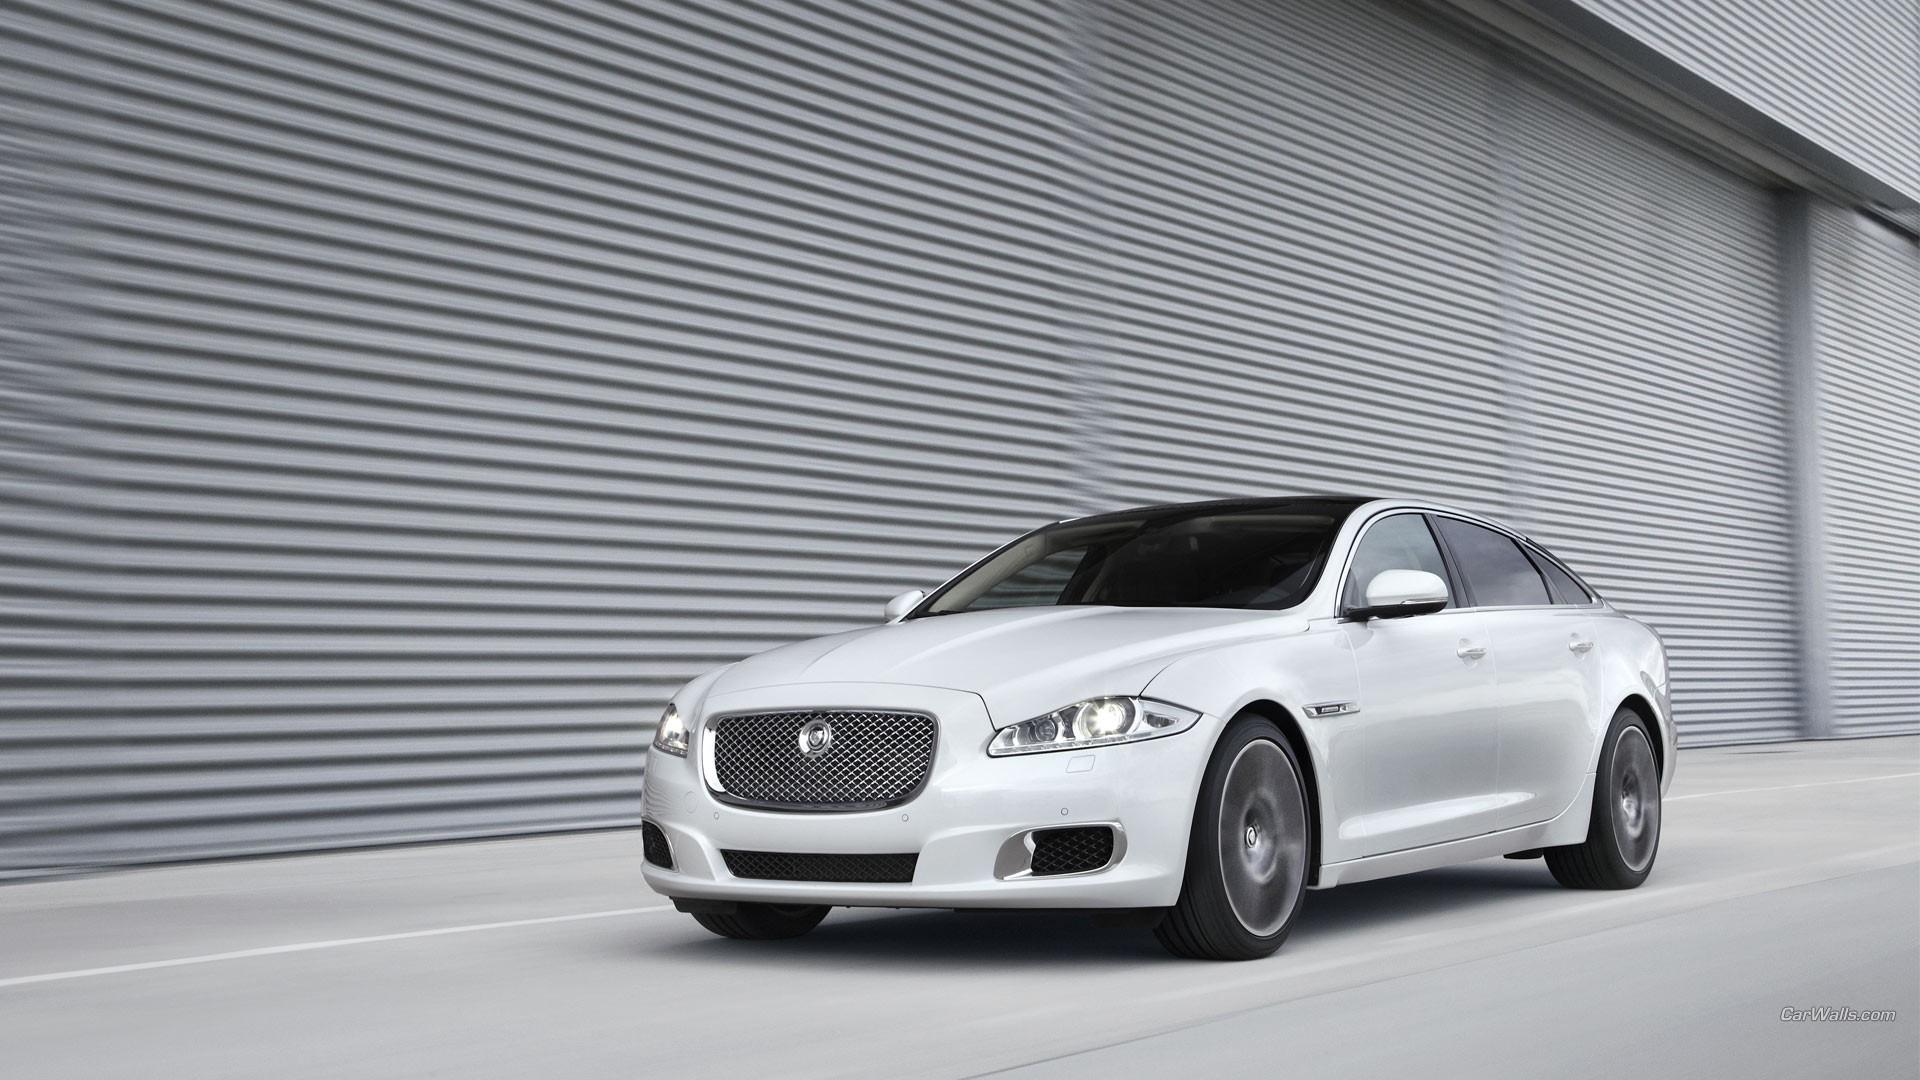 car vehicle performance car Sedan Jaguar XJ wheel 1920x1080 px land vehicle automotive design automotive exterior